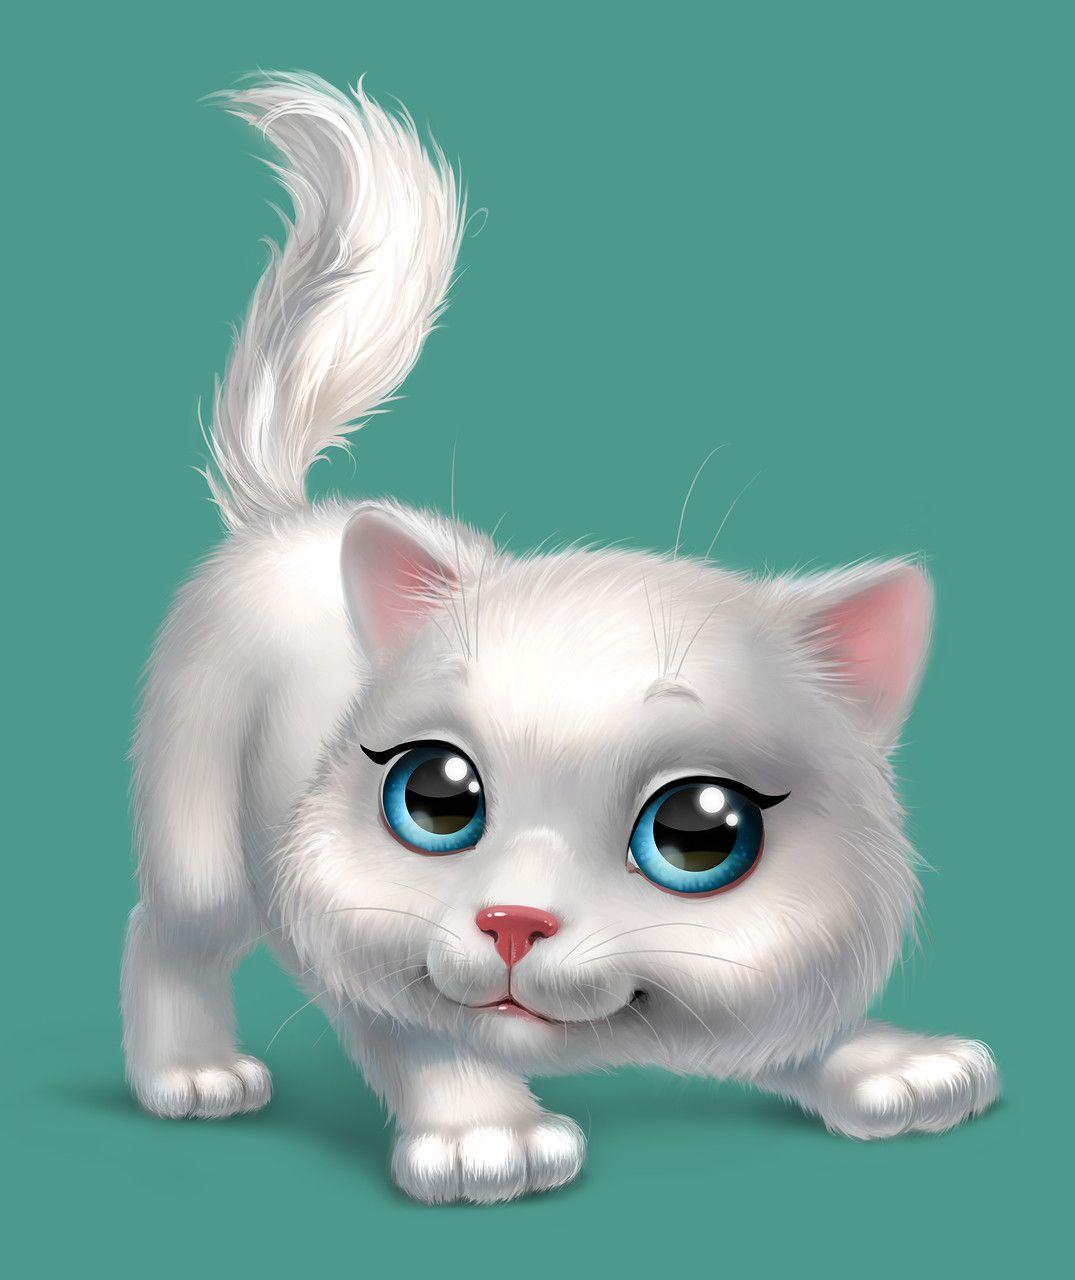 Картинка милой кошечки рисунки